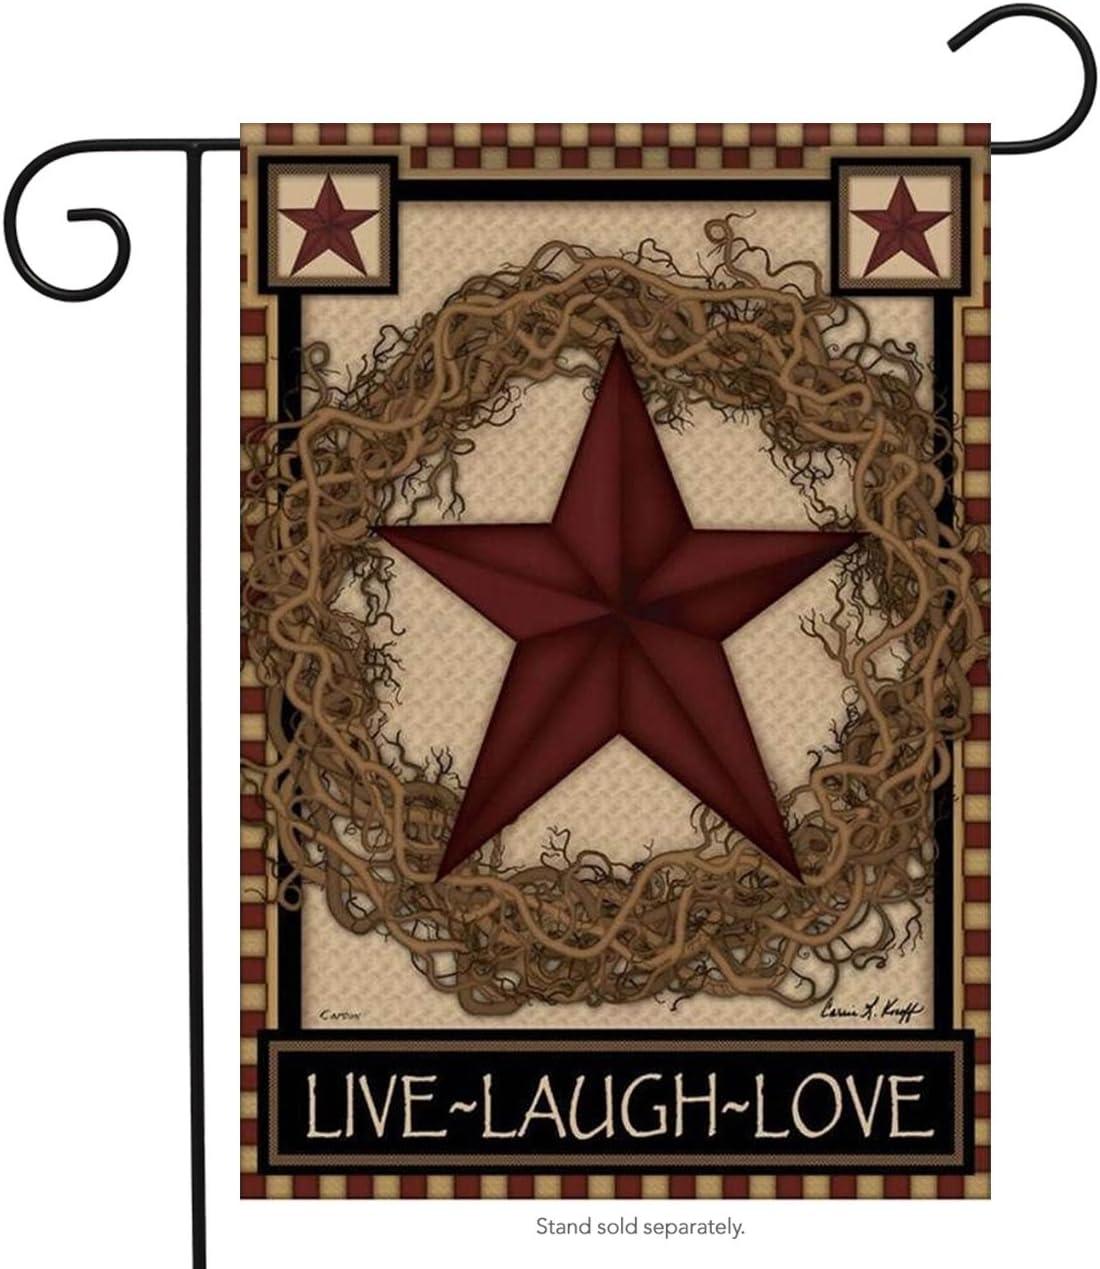 Carson Star Wreath Garden Flag 45206